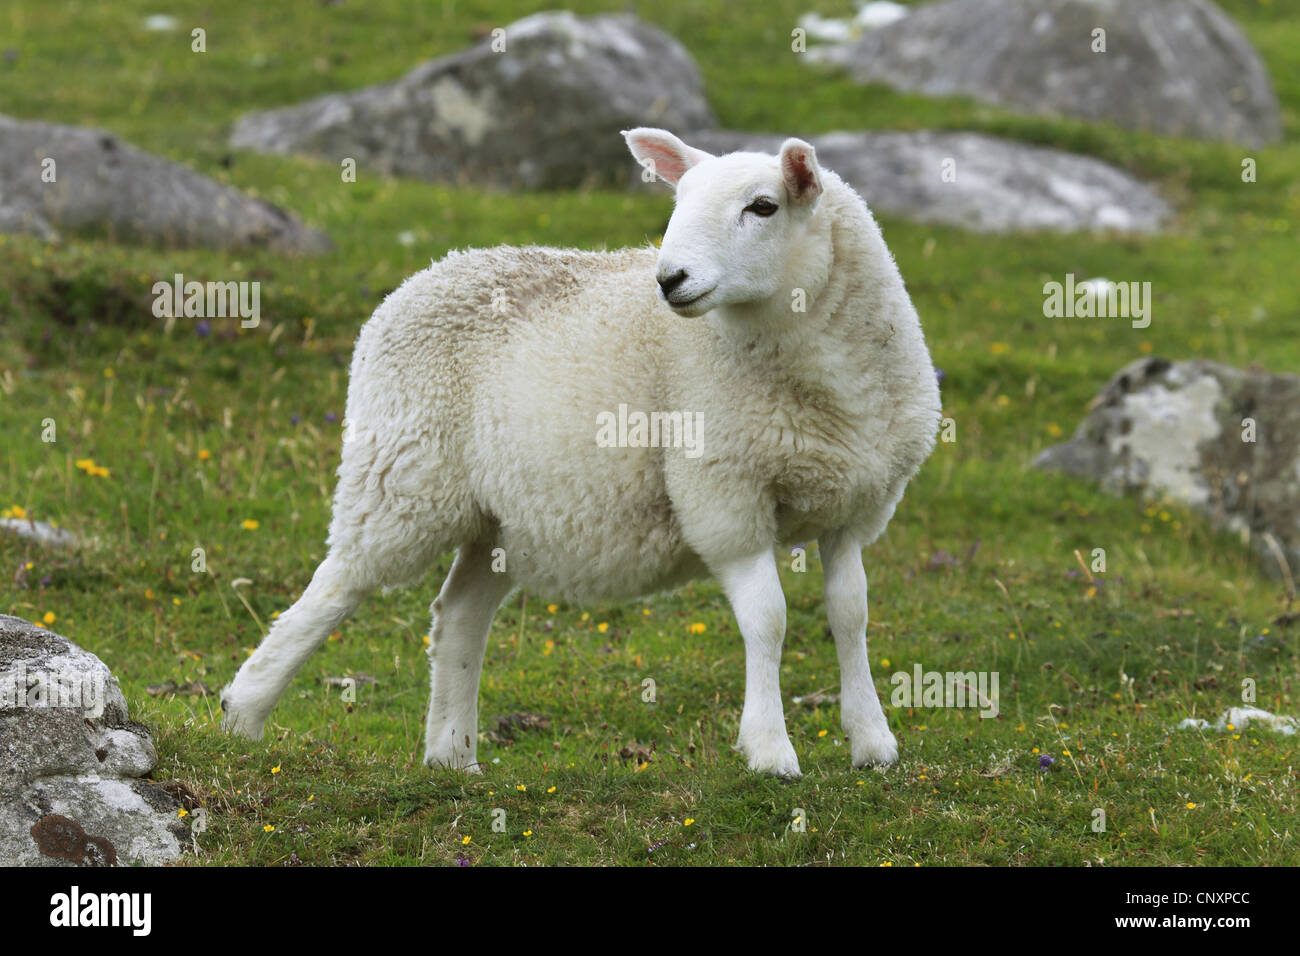 domestic sheep (Ovis ammon f. aries), lamb on a pasture, United Kingdom, Scotland - Stock Image